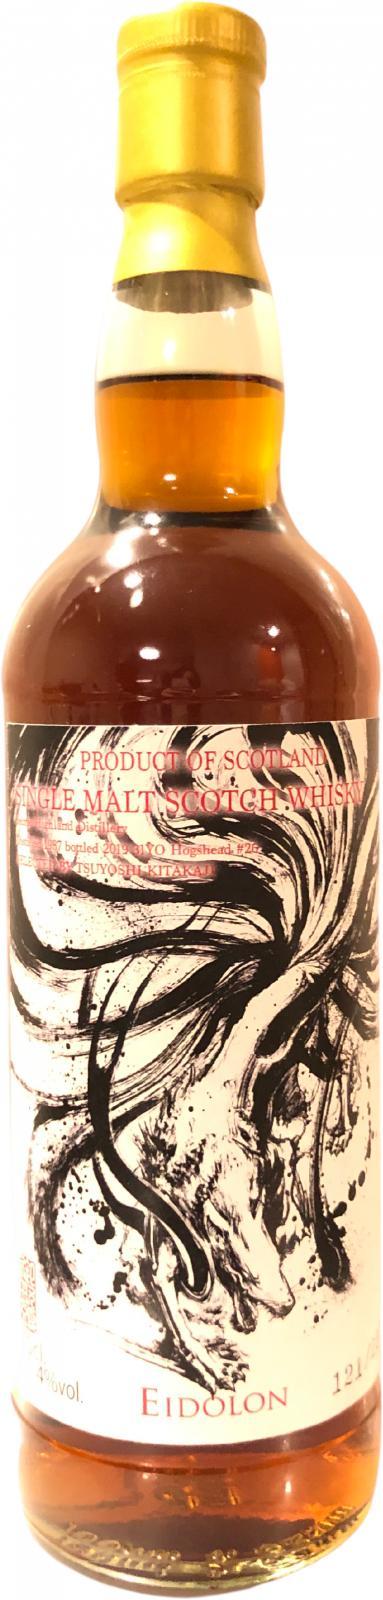 Secret Highland Distillery 1987 Rud